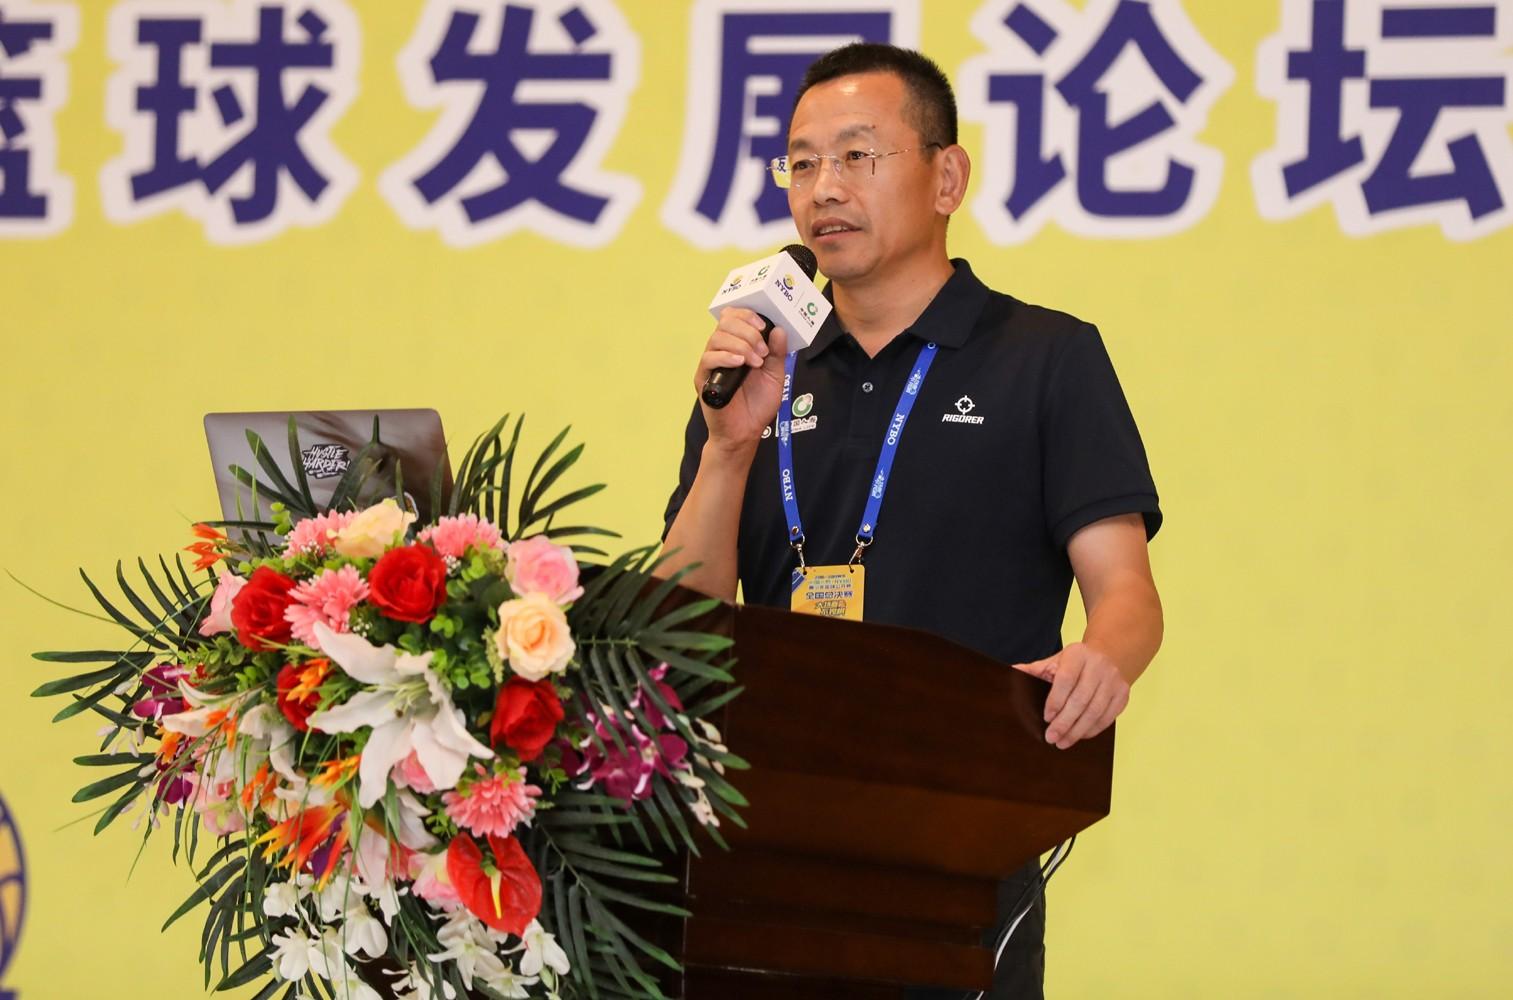 9.NYBO青少年篮球公开赛发起人、NYBO组委会主任陆浩在第三届中国青少年篮球发展论坛致辞.jpg